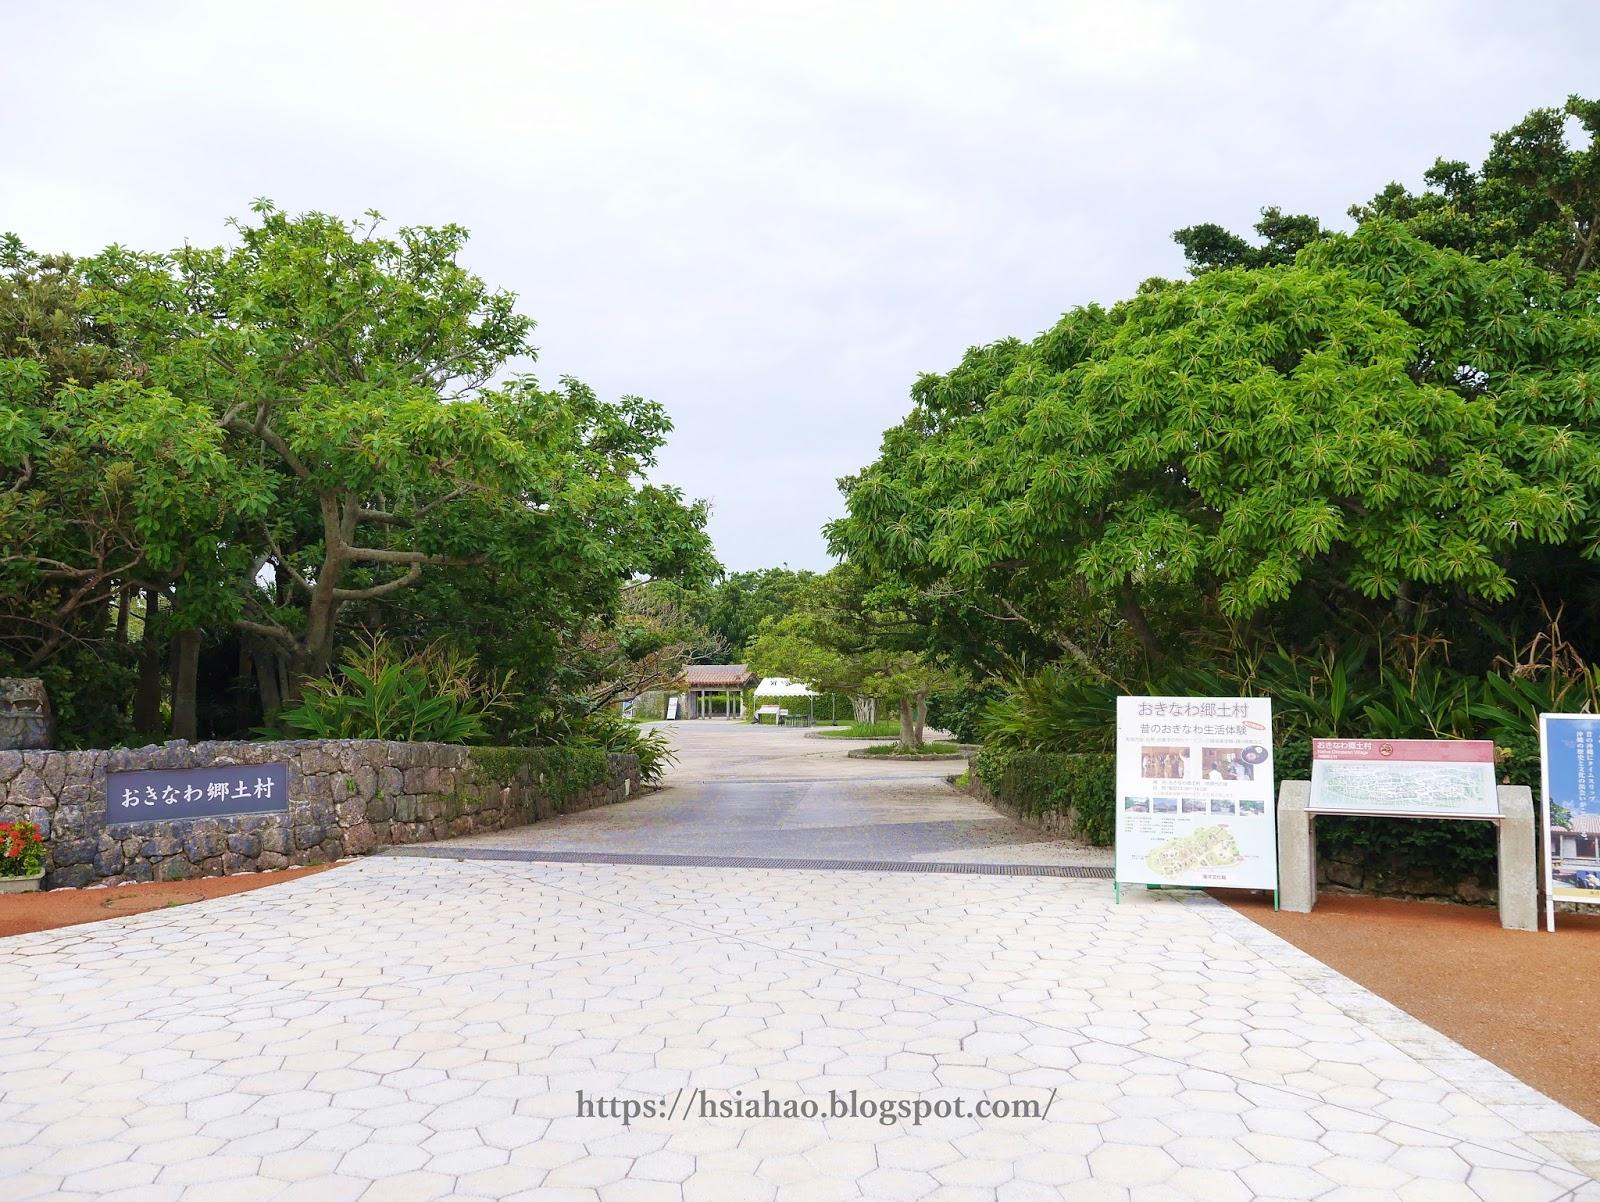 沖繩-海洋博公園-沖繩鄉土村-思絡植物園-おもろ植物園-景點-自由行-旅遊-旅行-okinawa-ocean-expo-park